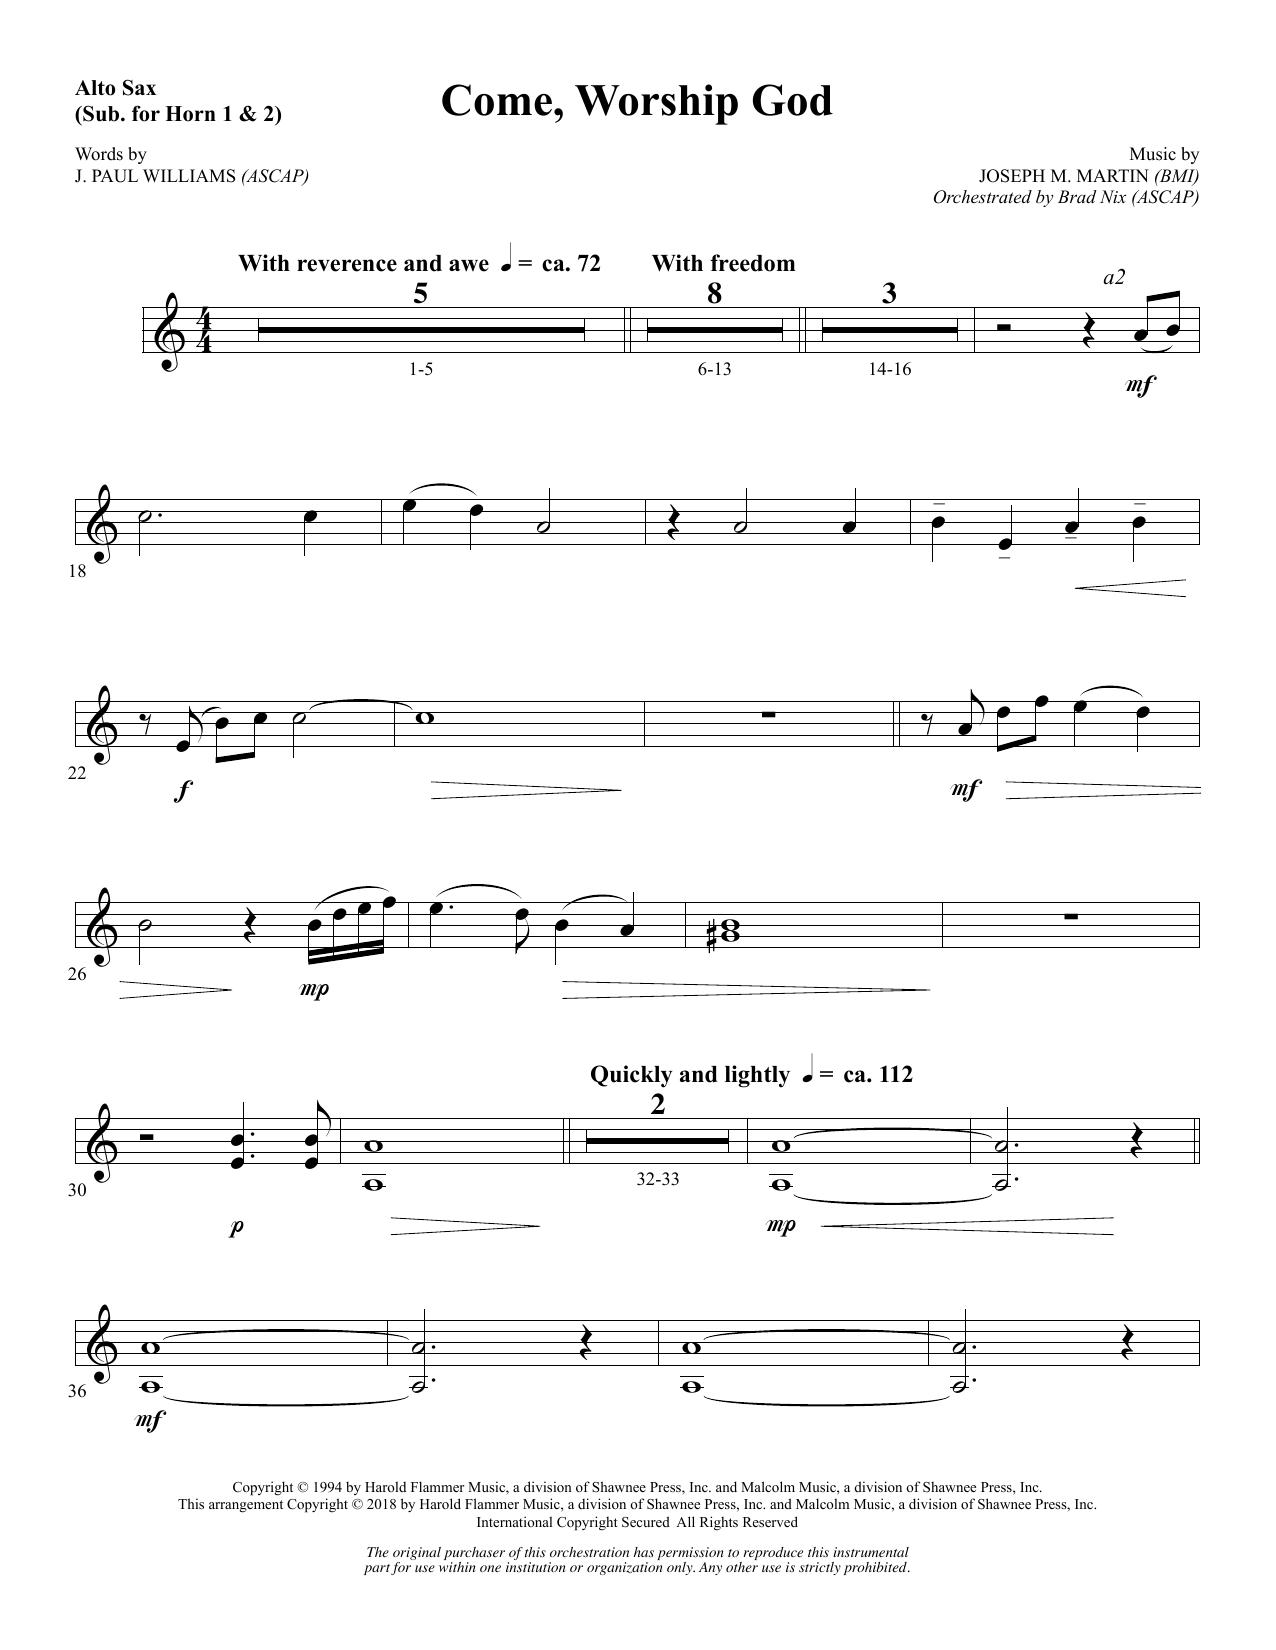 Come, Worship God - Alto Sax 1-2 (sub. Horn 1-2) (Choir Instrumental Pak)